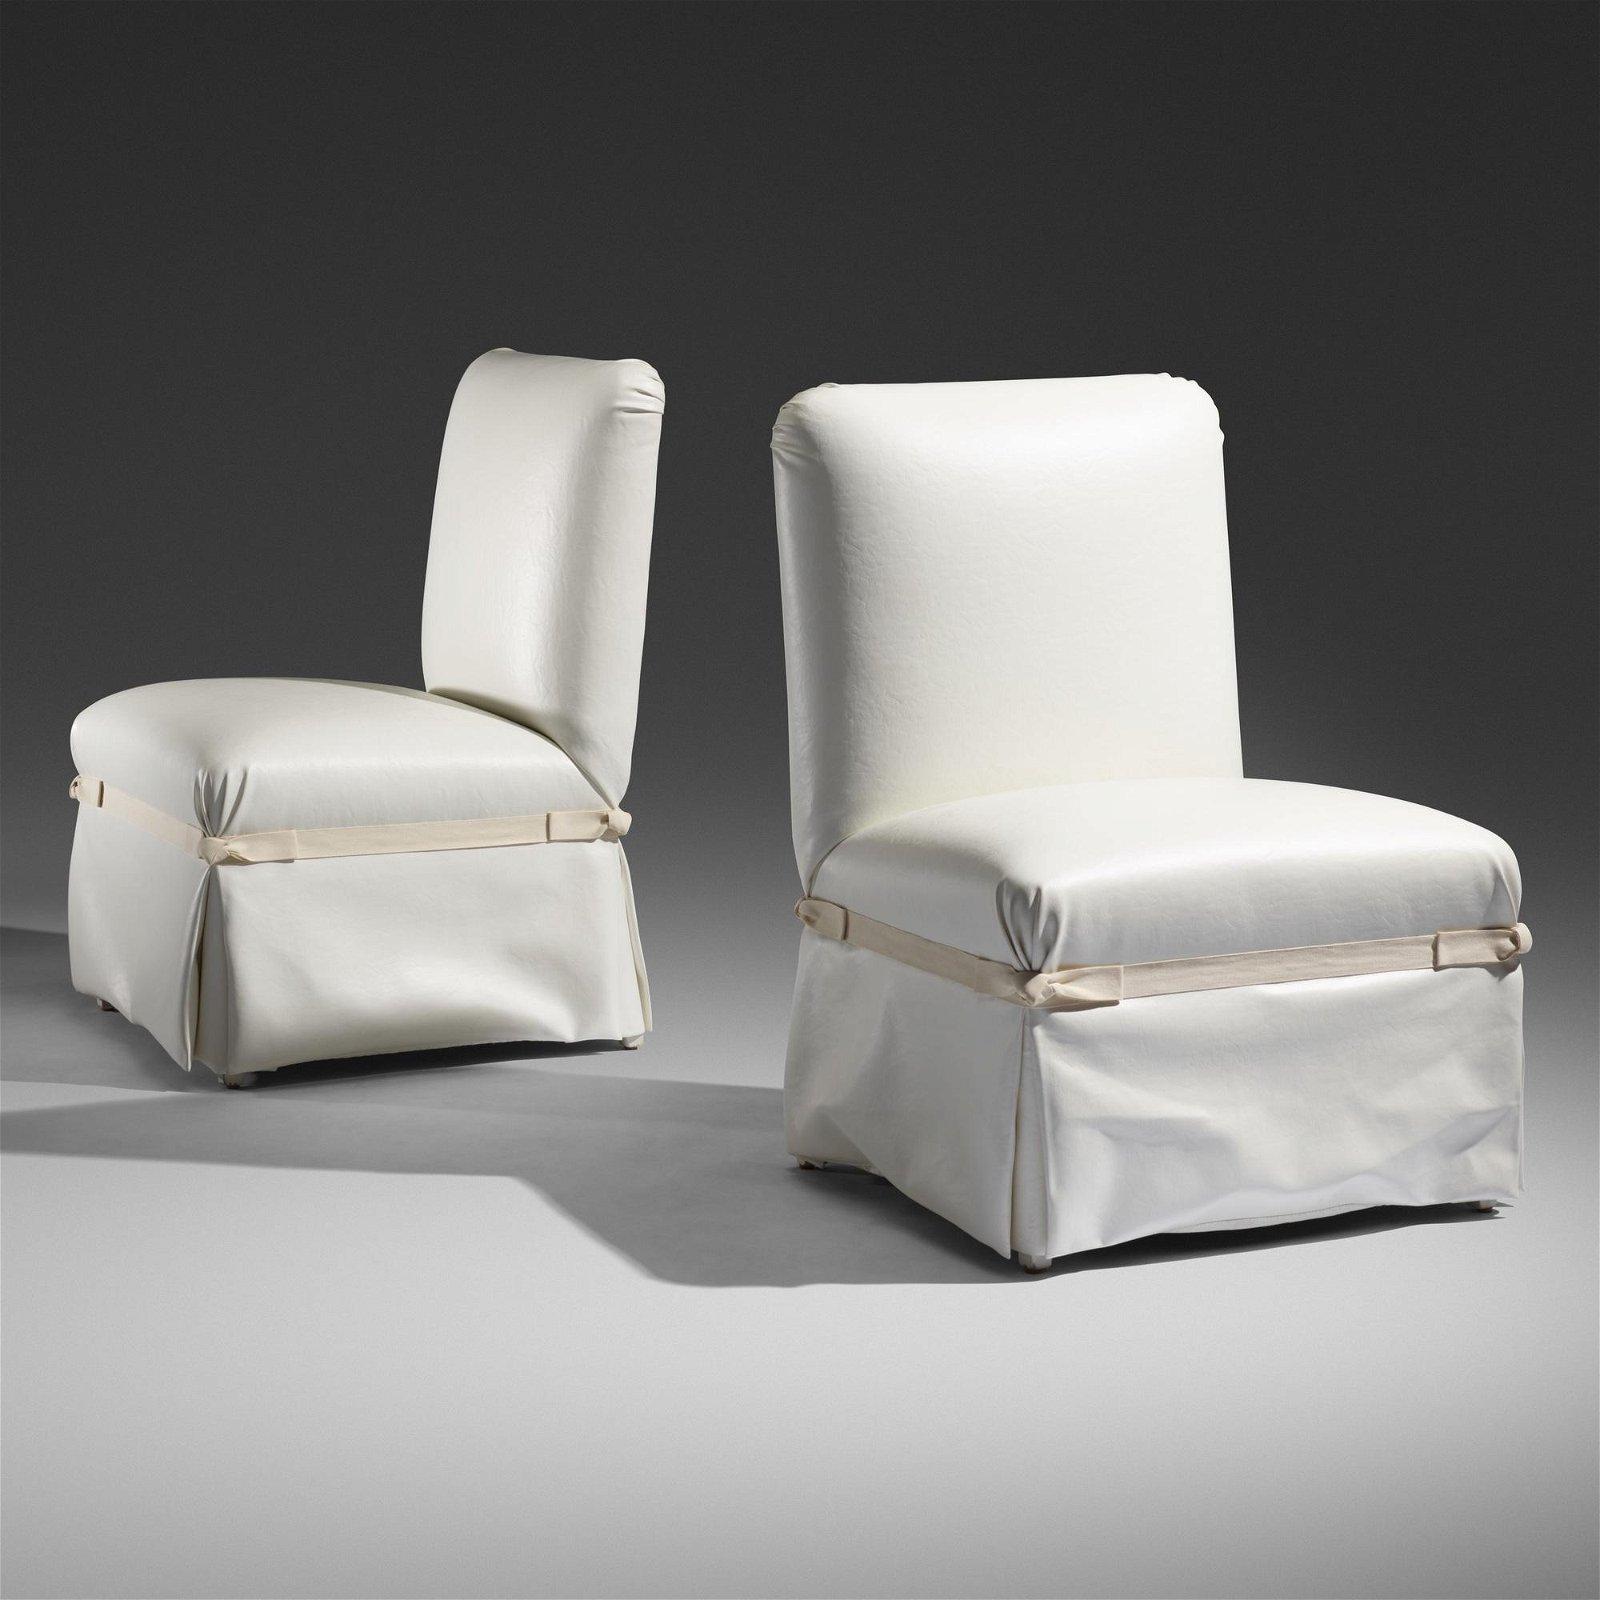 John Dickinson, chairs for Carlene Safdie, pair